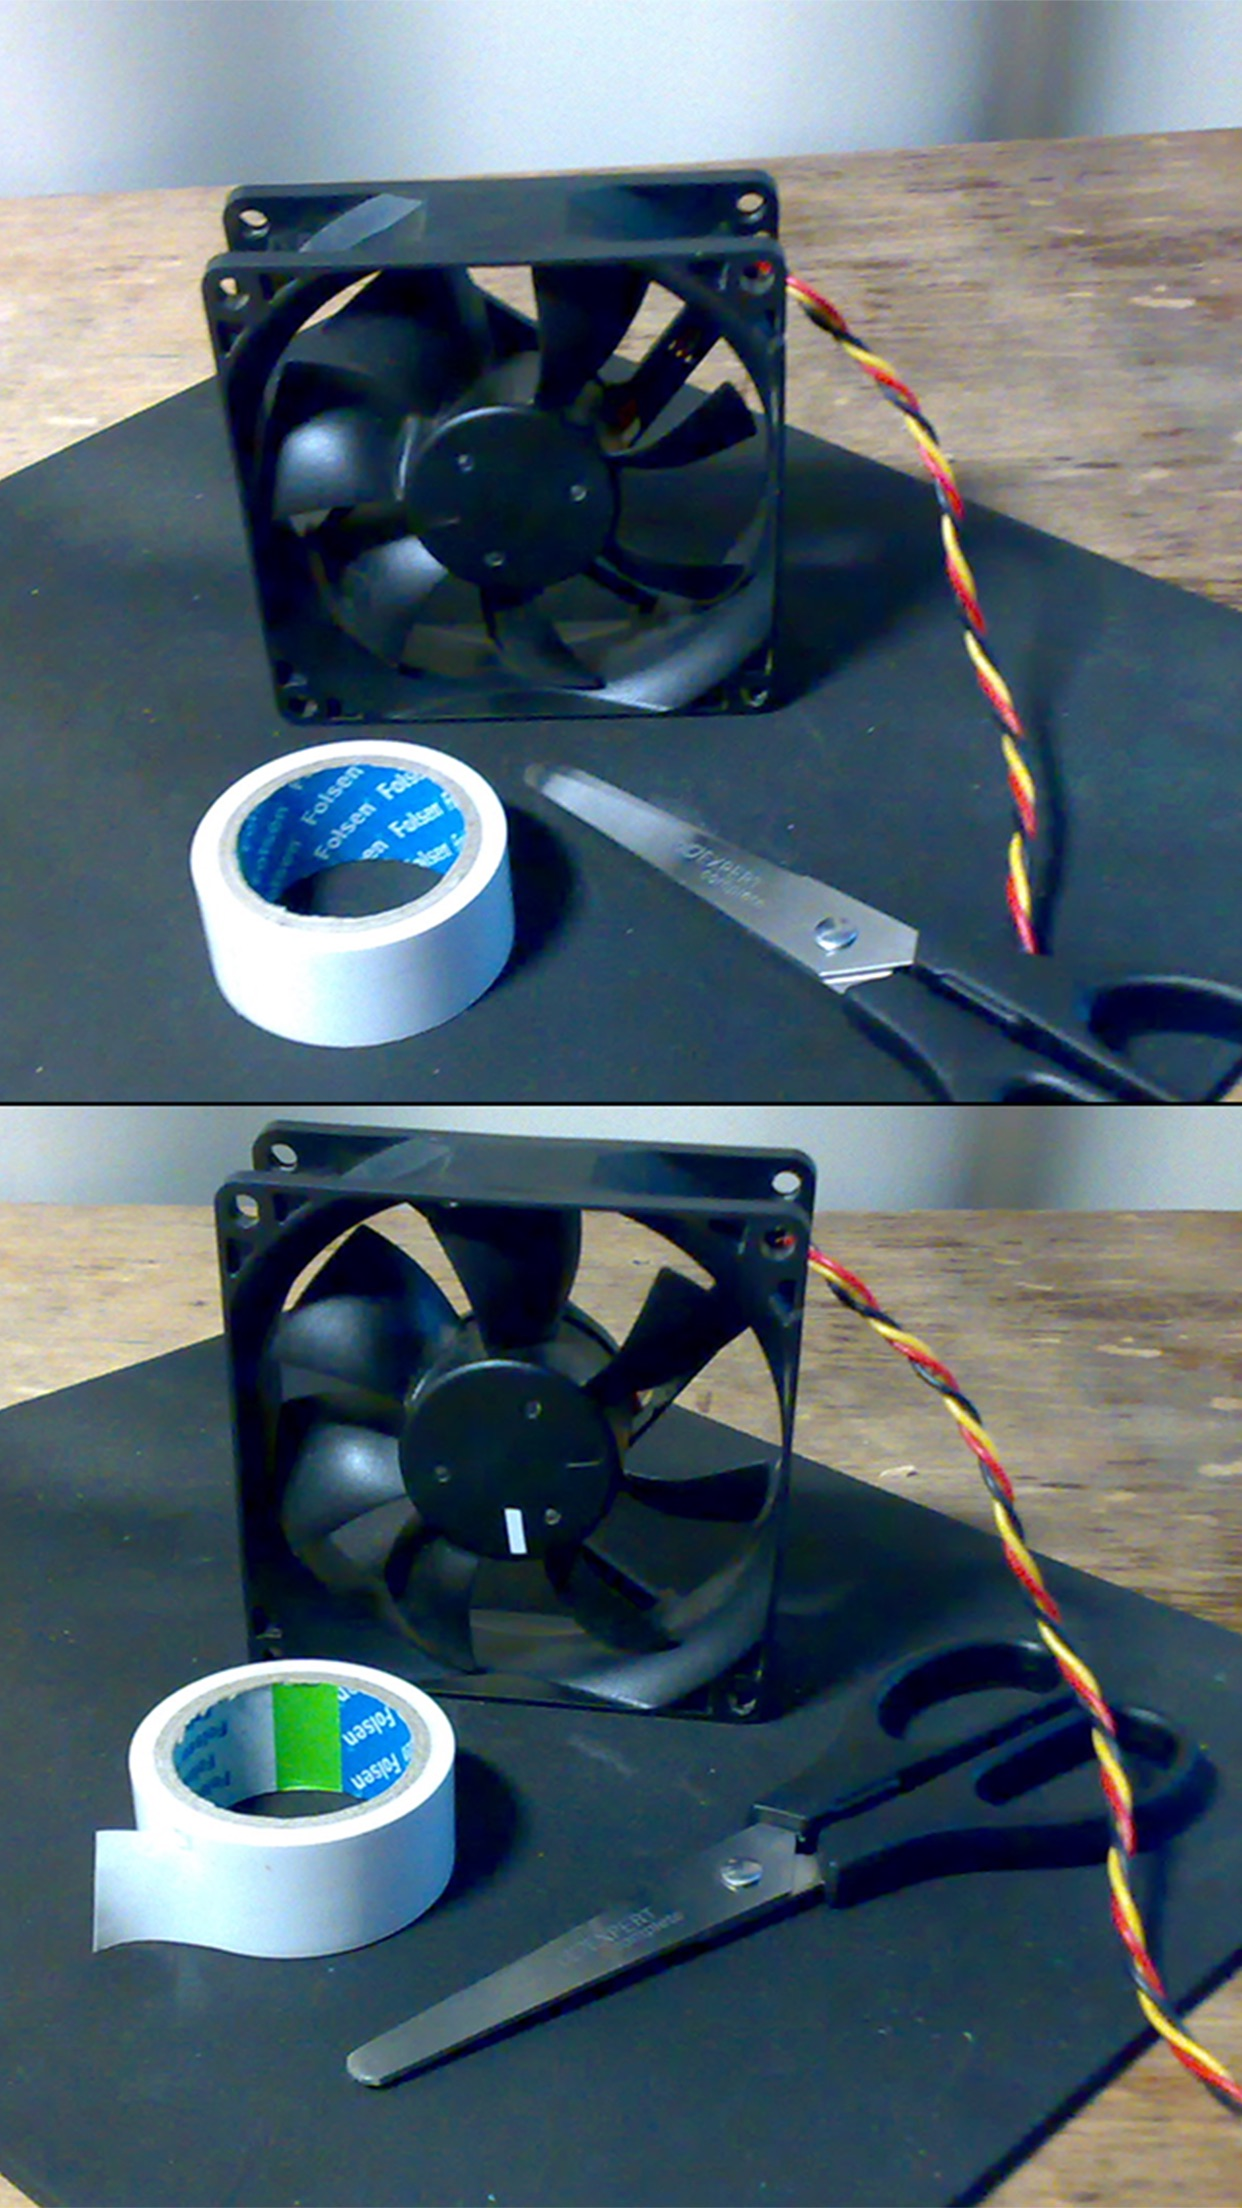 Strobe tachometer (RPM meter) Screenshot